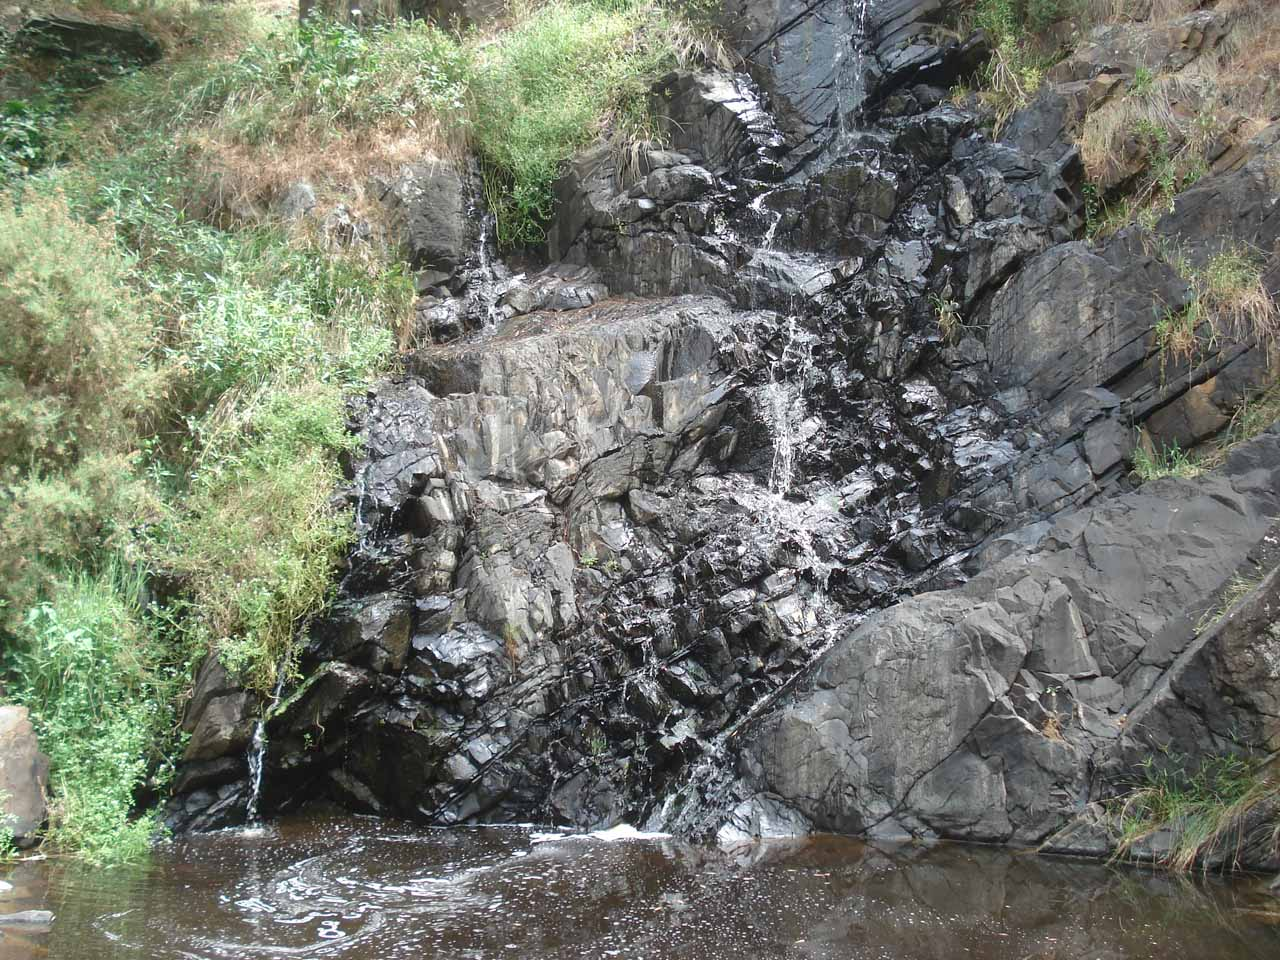 The trickling Ingalalla Falls